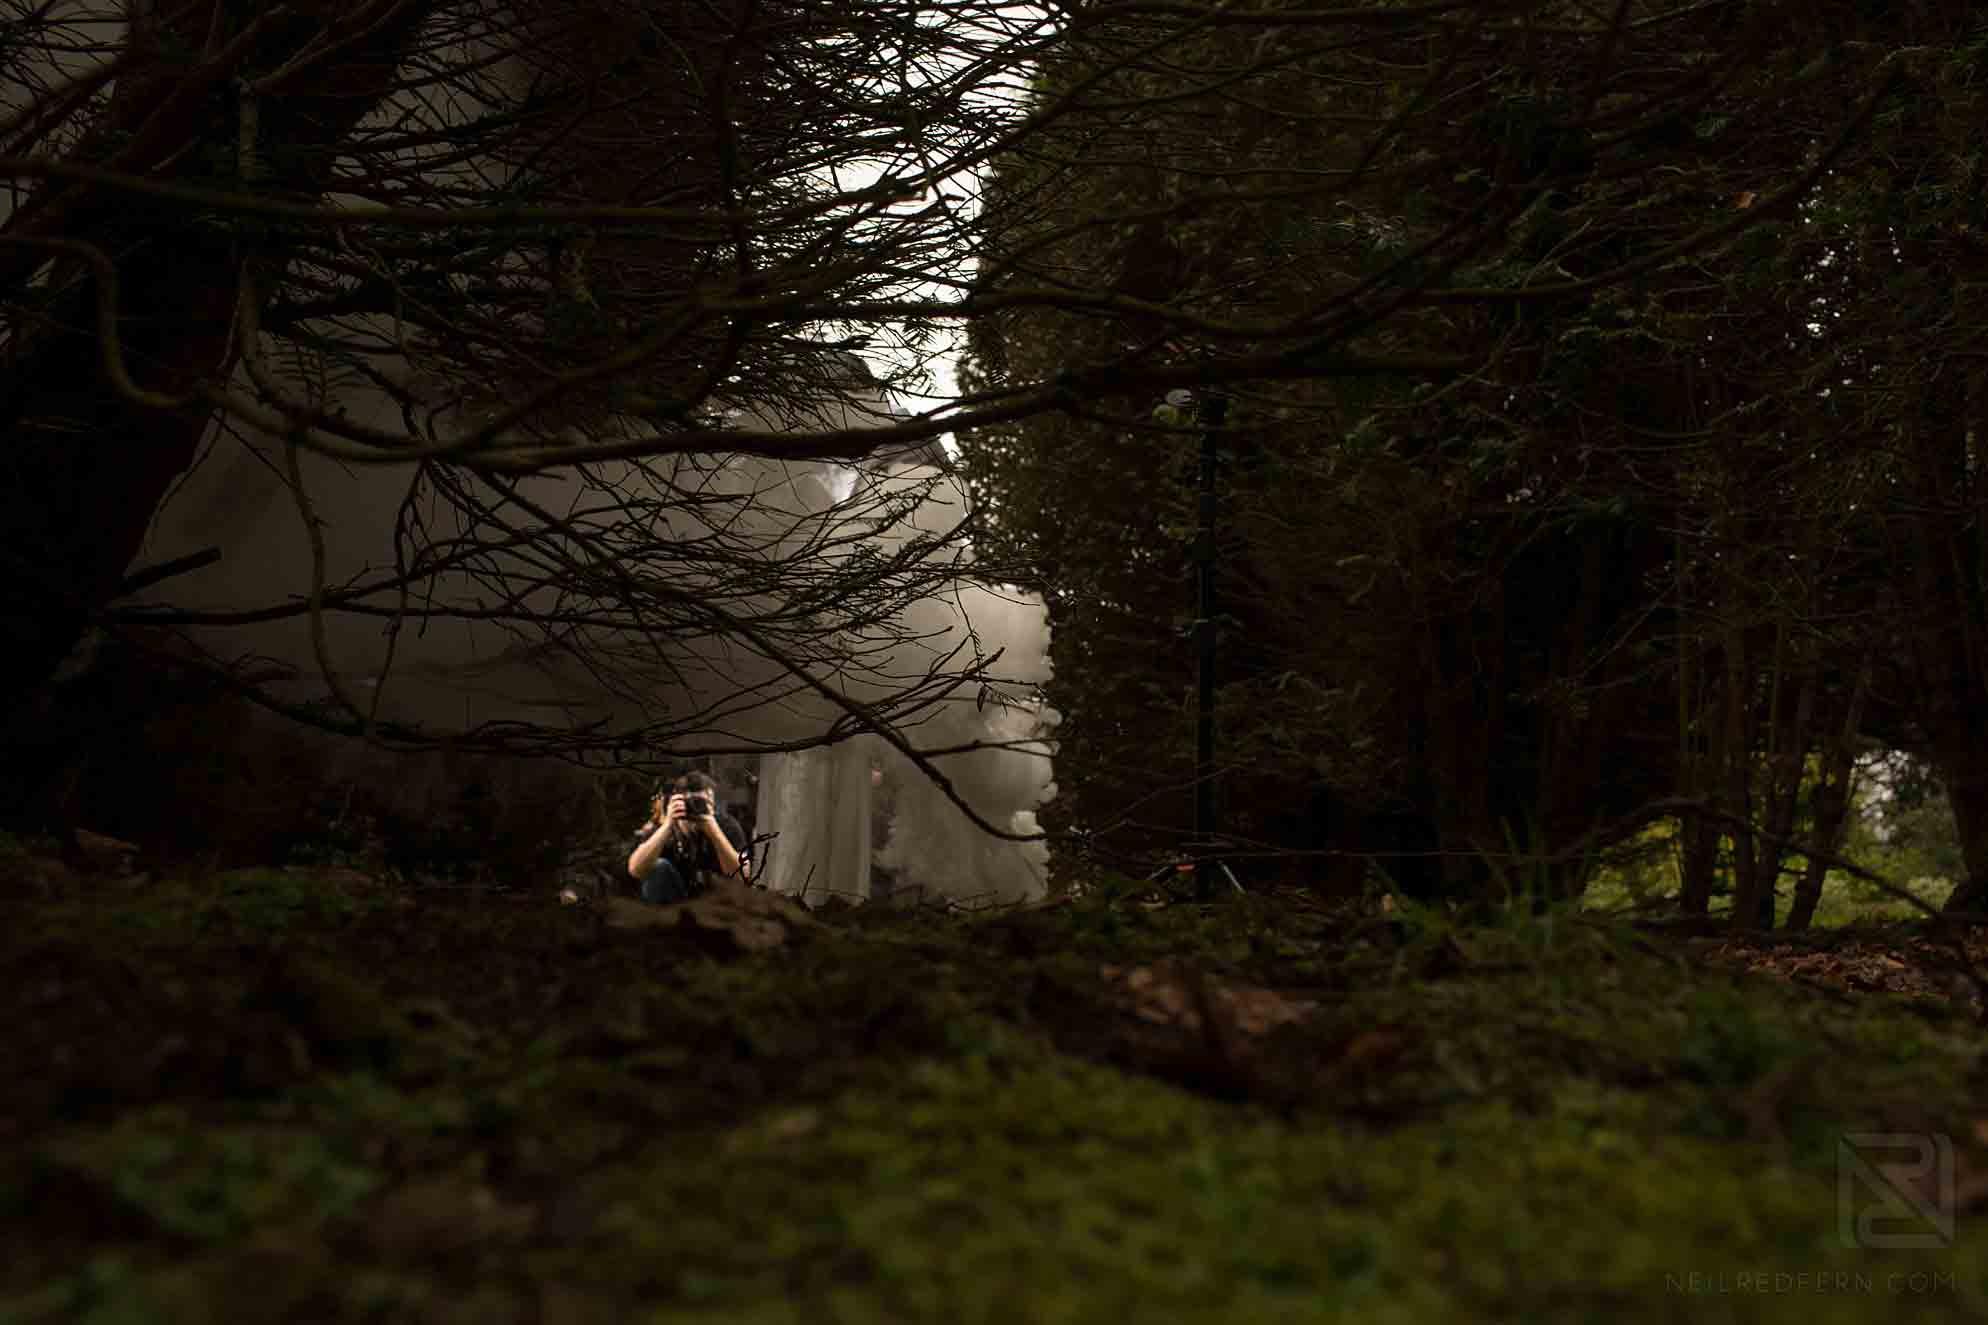 behind-the-scene-photograph-Neil-Redfern-workshop-17